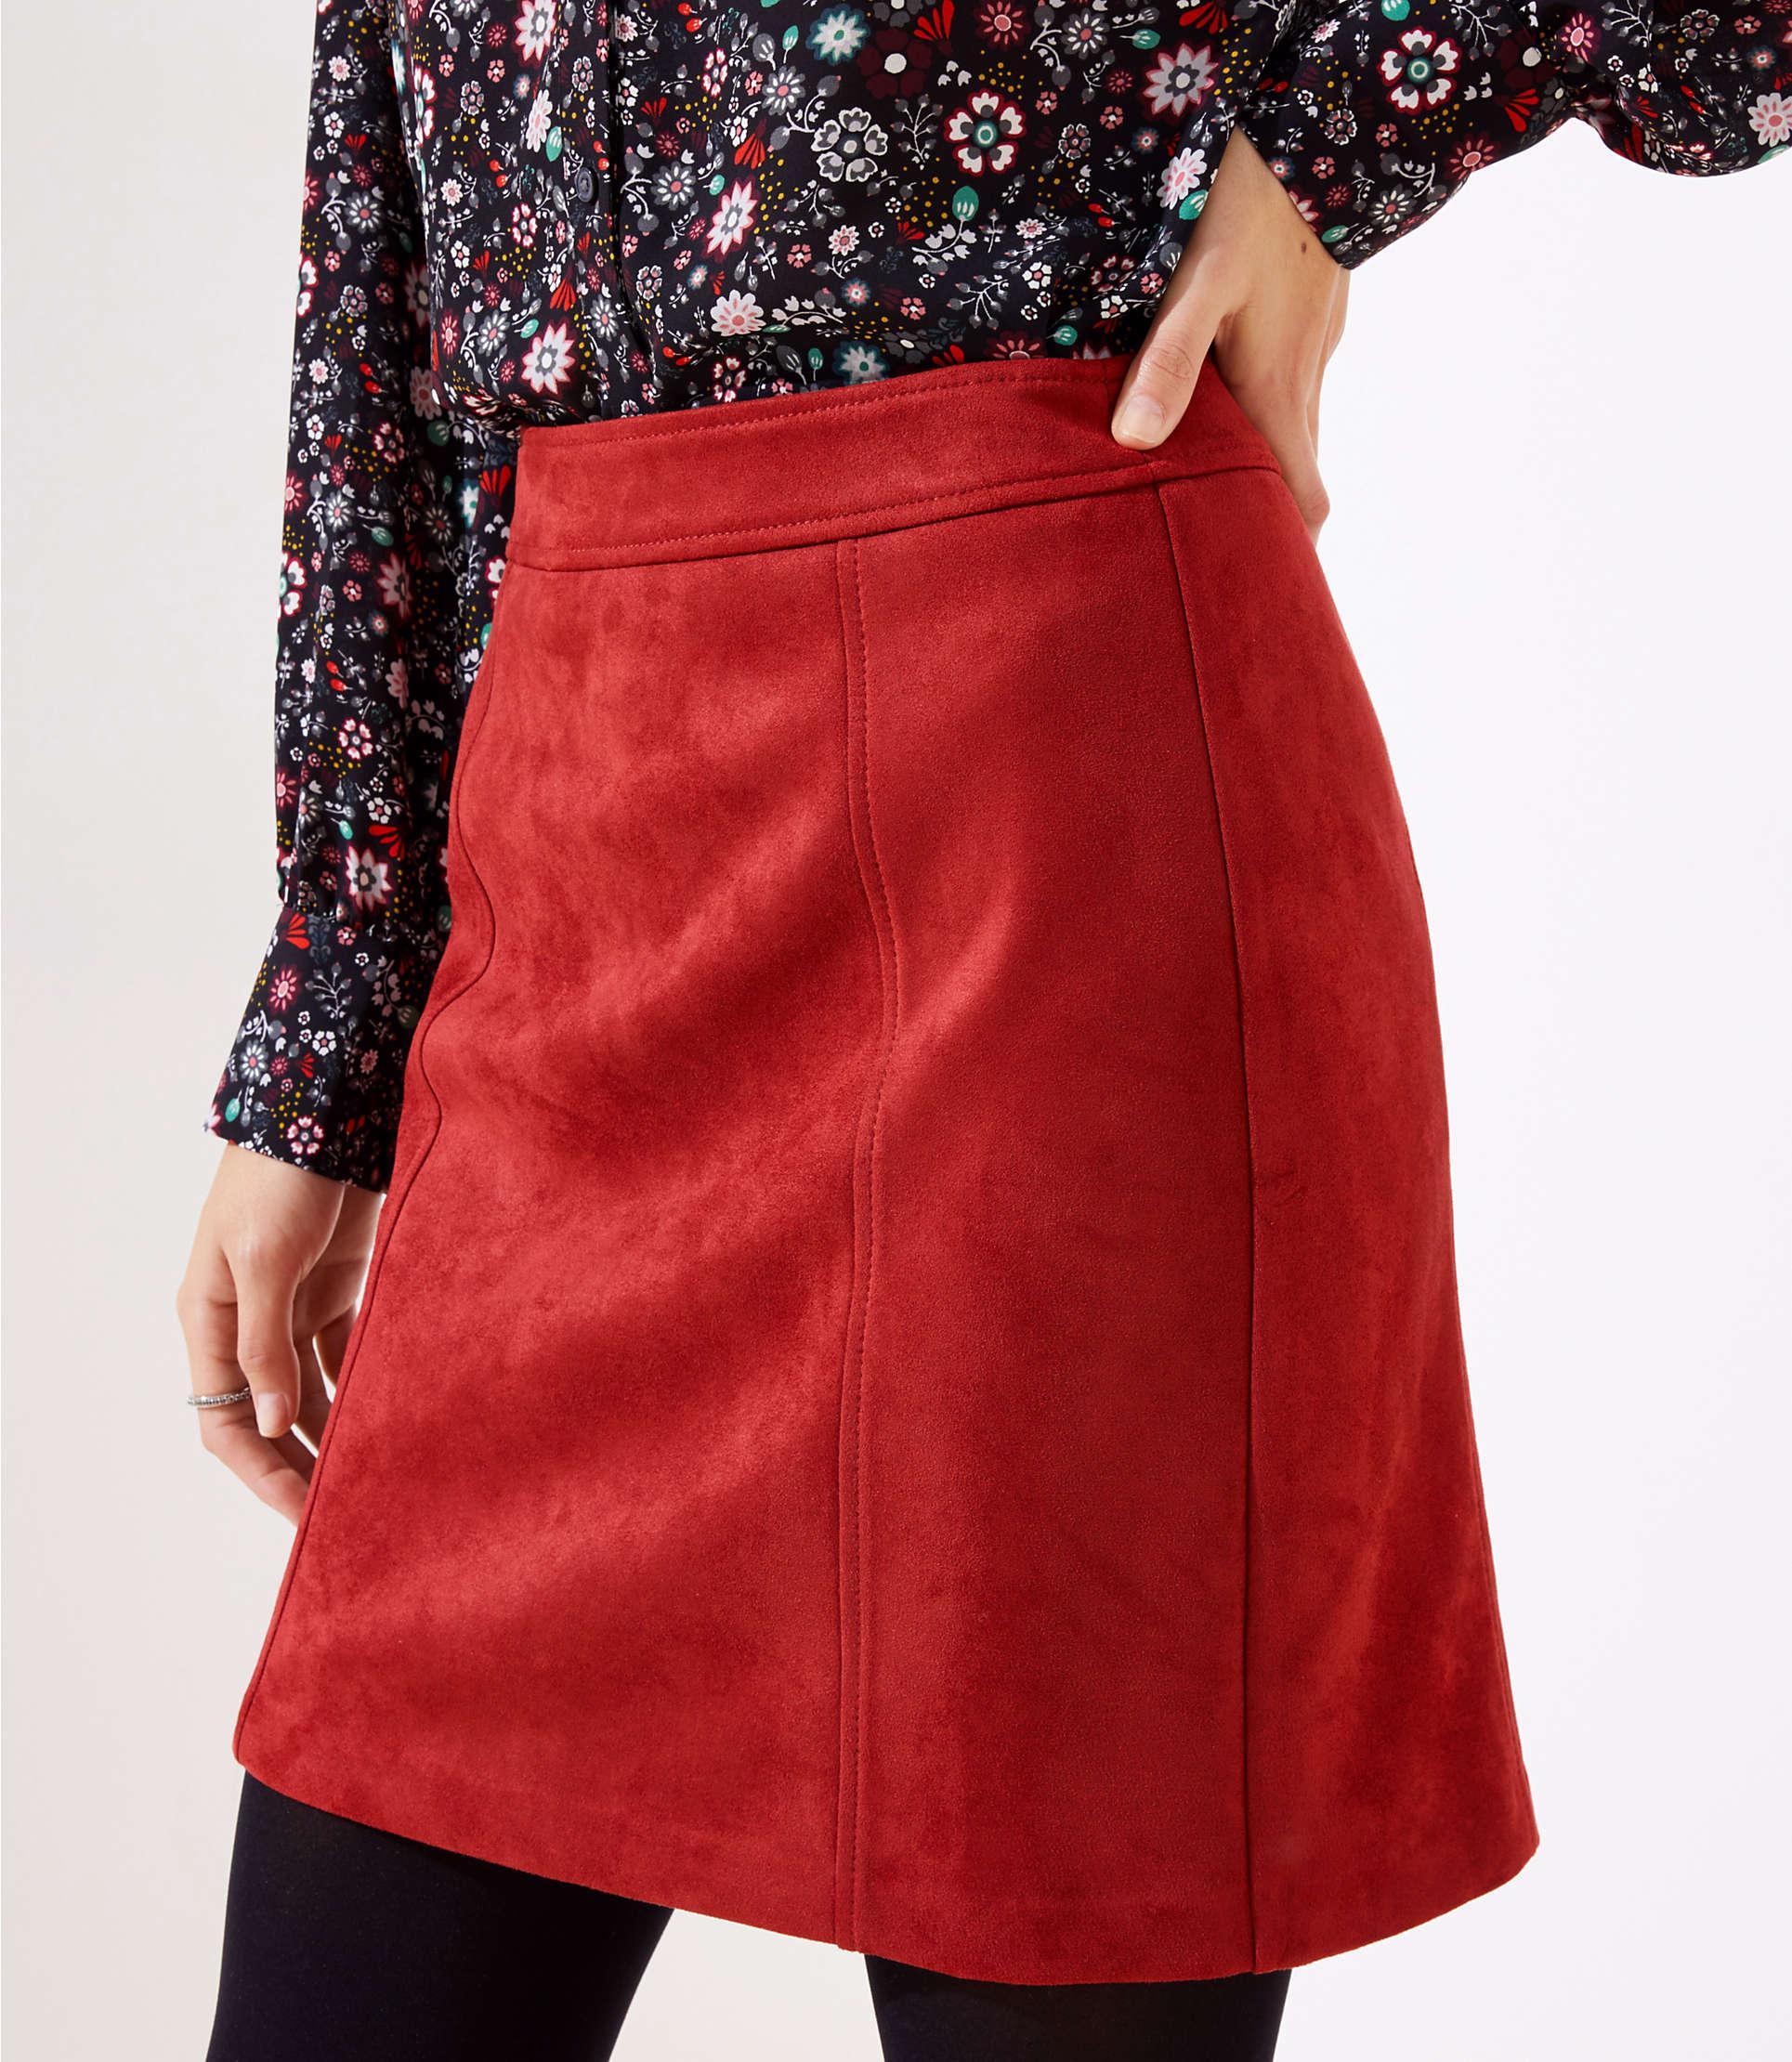 f45ad1b1a LOFT - Red Petite Faux Suede Shift Skirt - Lyst. View fullscreen